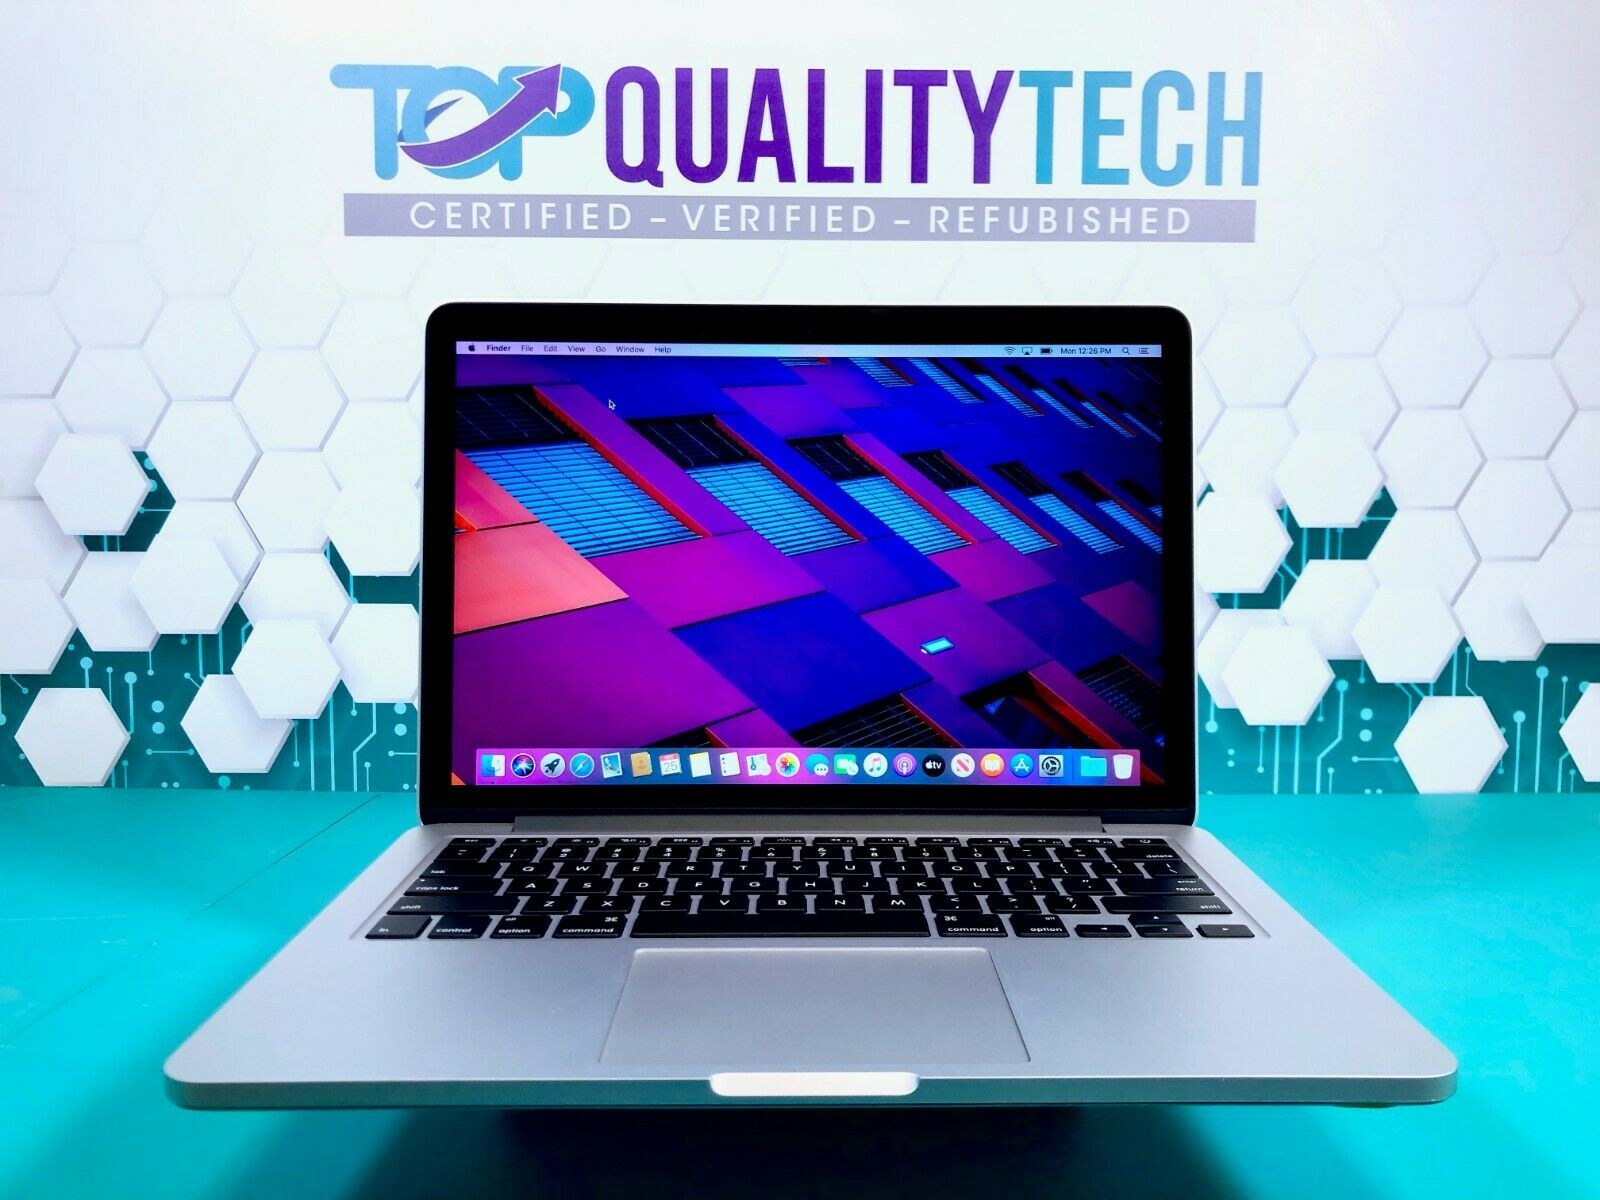 ULTRA Apple MacBook Pro Retina 13 Inch 2015-2015 256GB SSD / 3 YEAR WARRANTY. Buy it now for 699.00